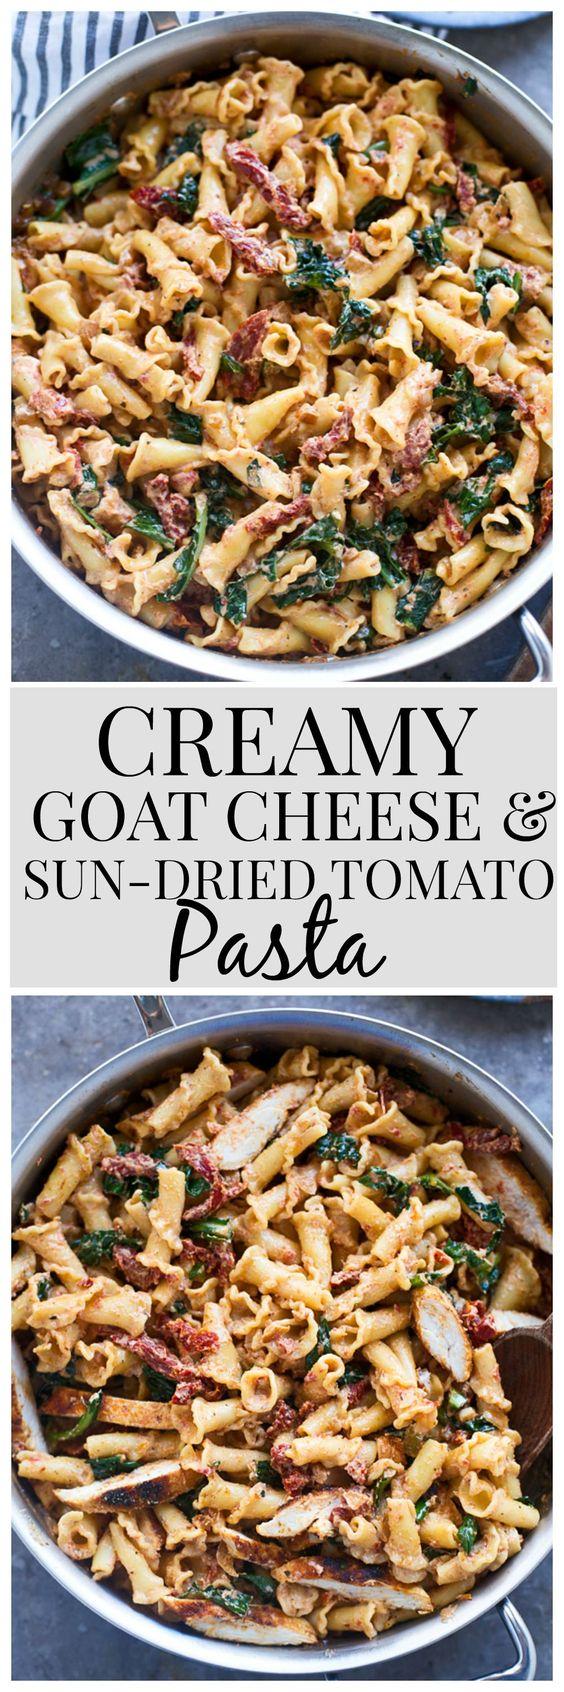 Creamy Goat Cheese and Sun-Dried Tomato Pasta